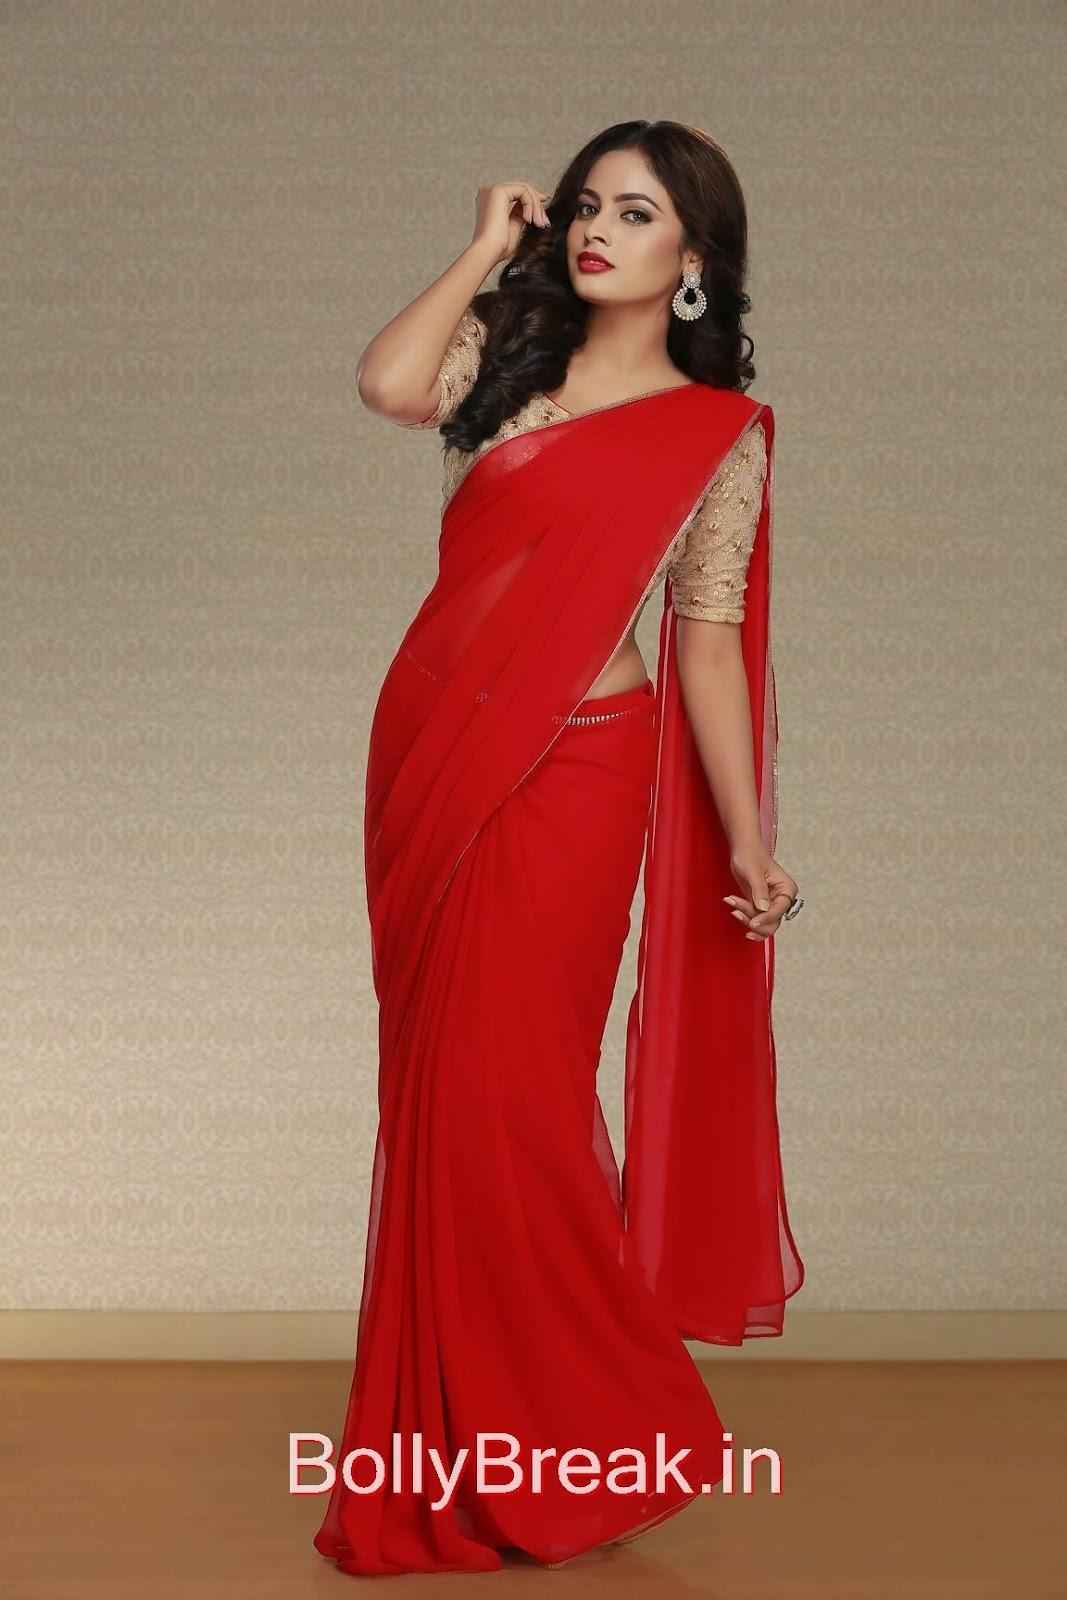 High Quality Nandita Pics, Actress Nandita Swetha in Saree - Hot HD 2015 Pics